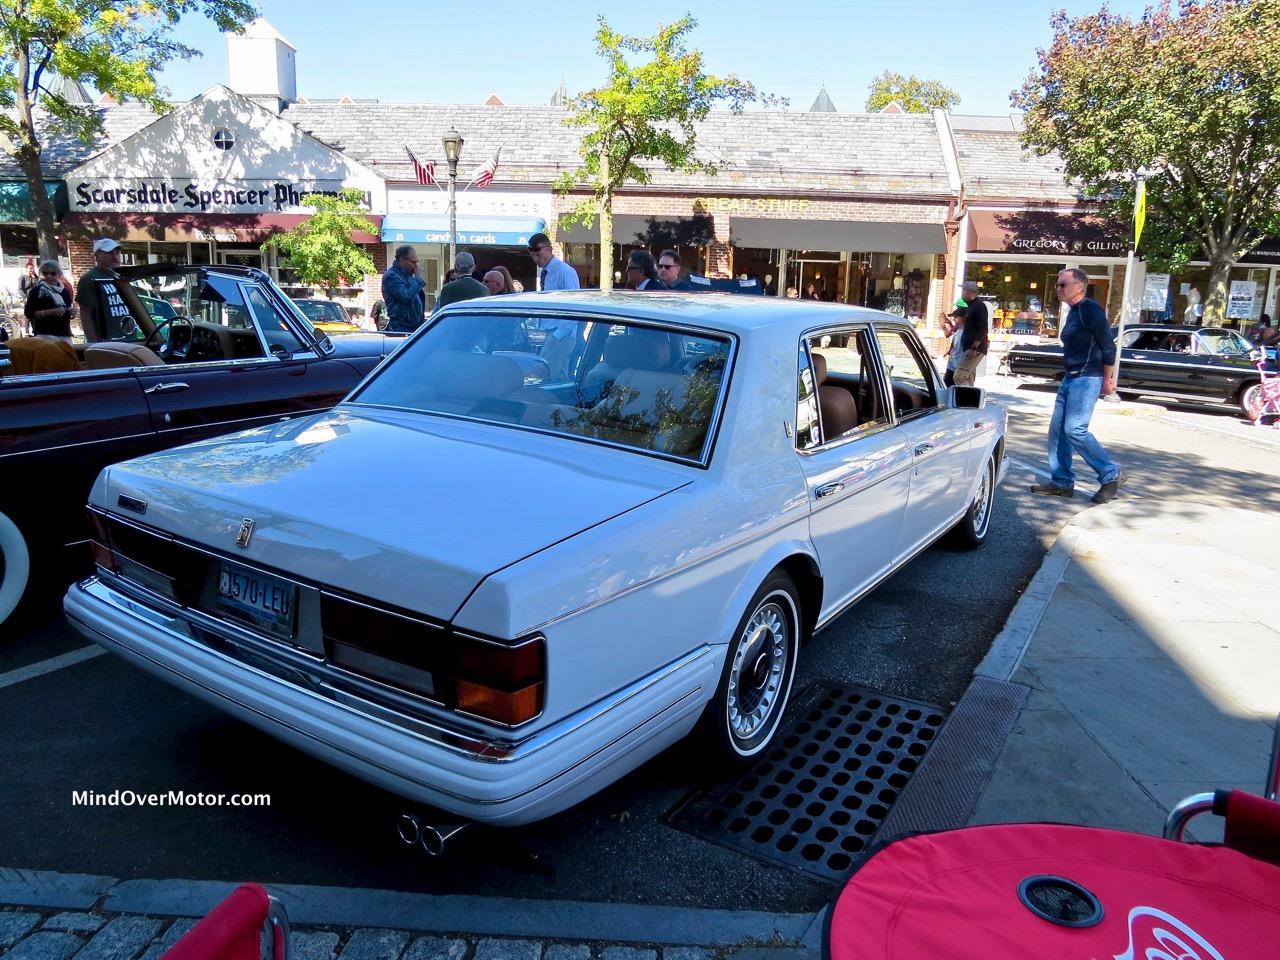 Rolls Royce Spur IV Rear